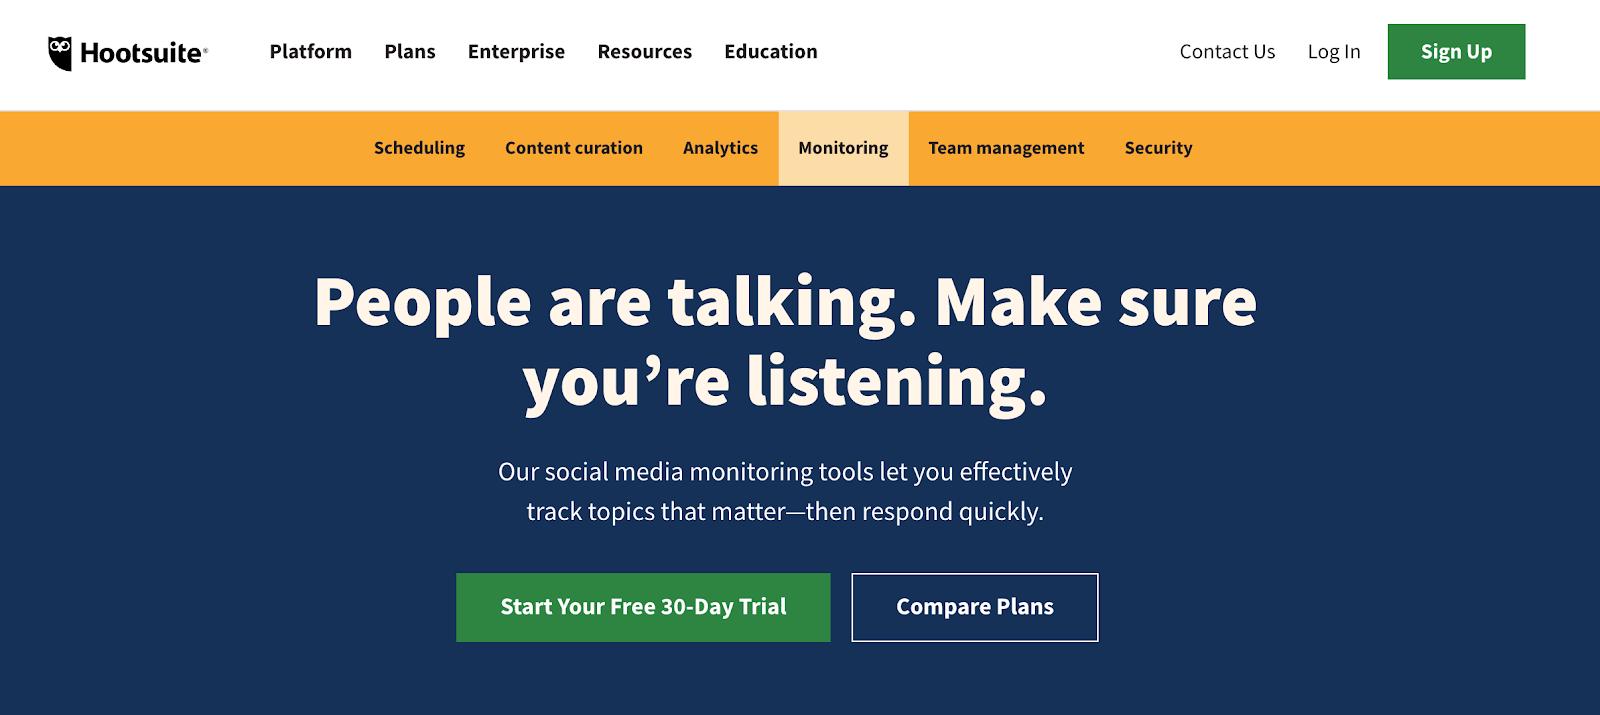 screenshot hootsuite landing page - social media monitoring